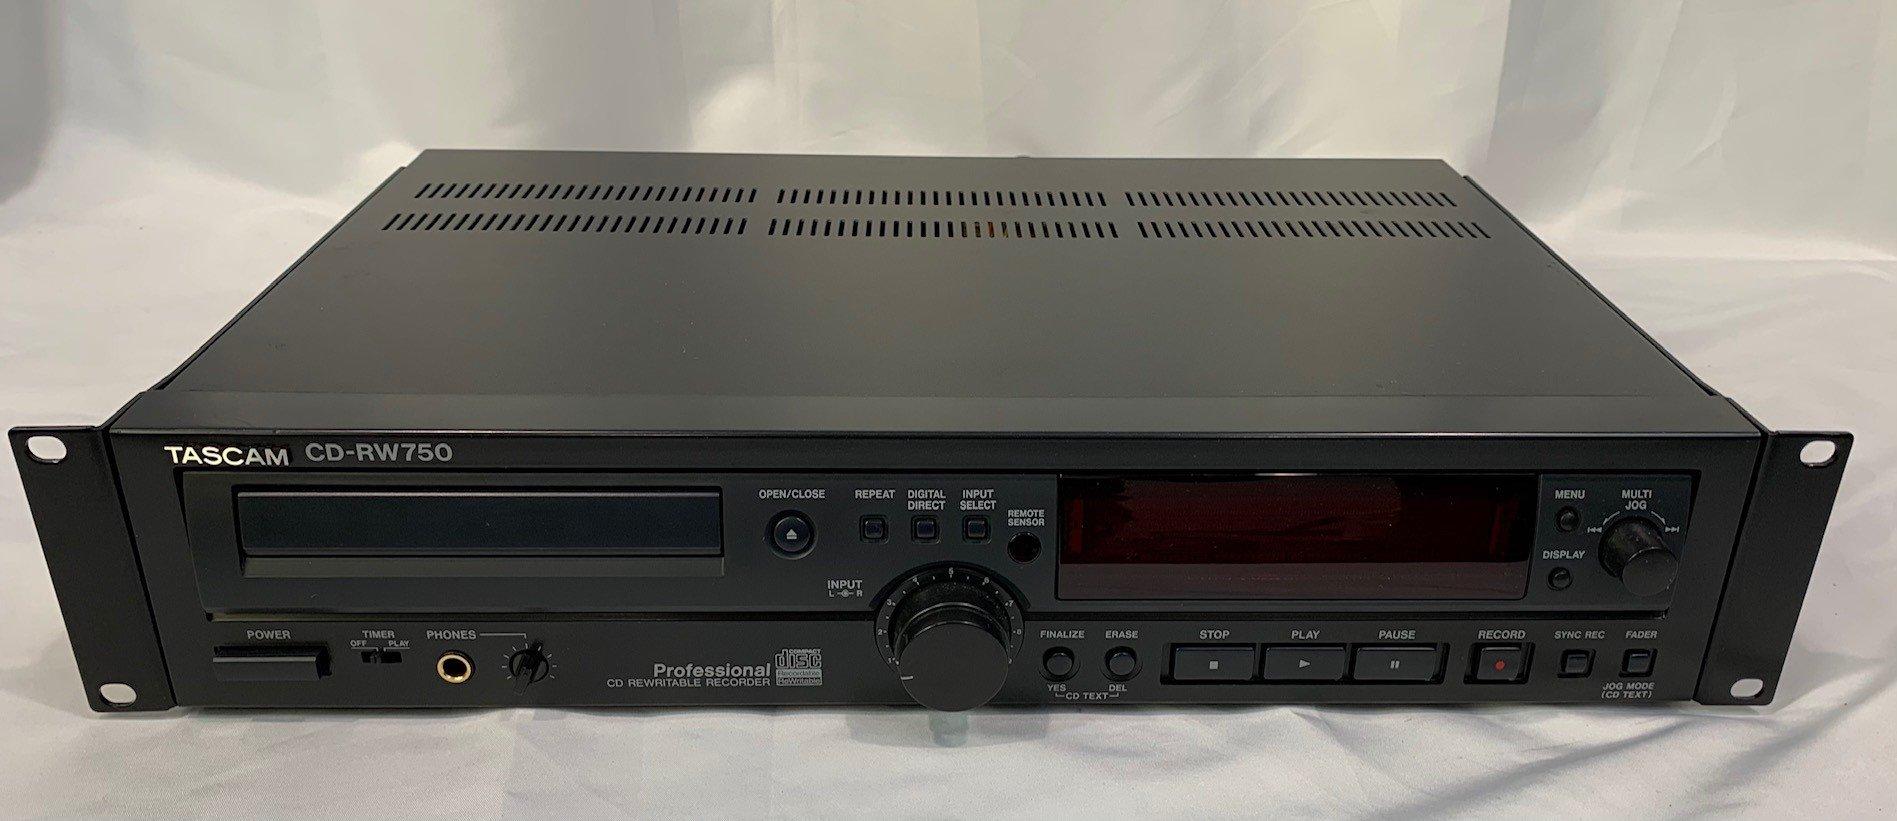 Tascam CD-RW750  Rewritable CD Recorder